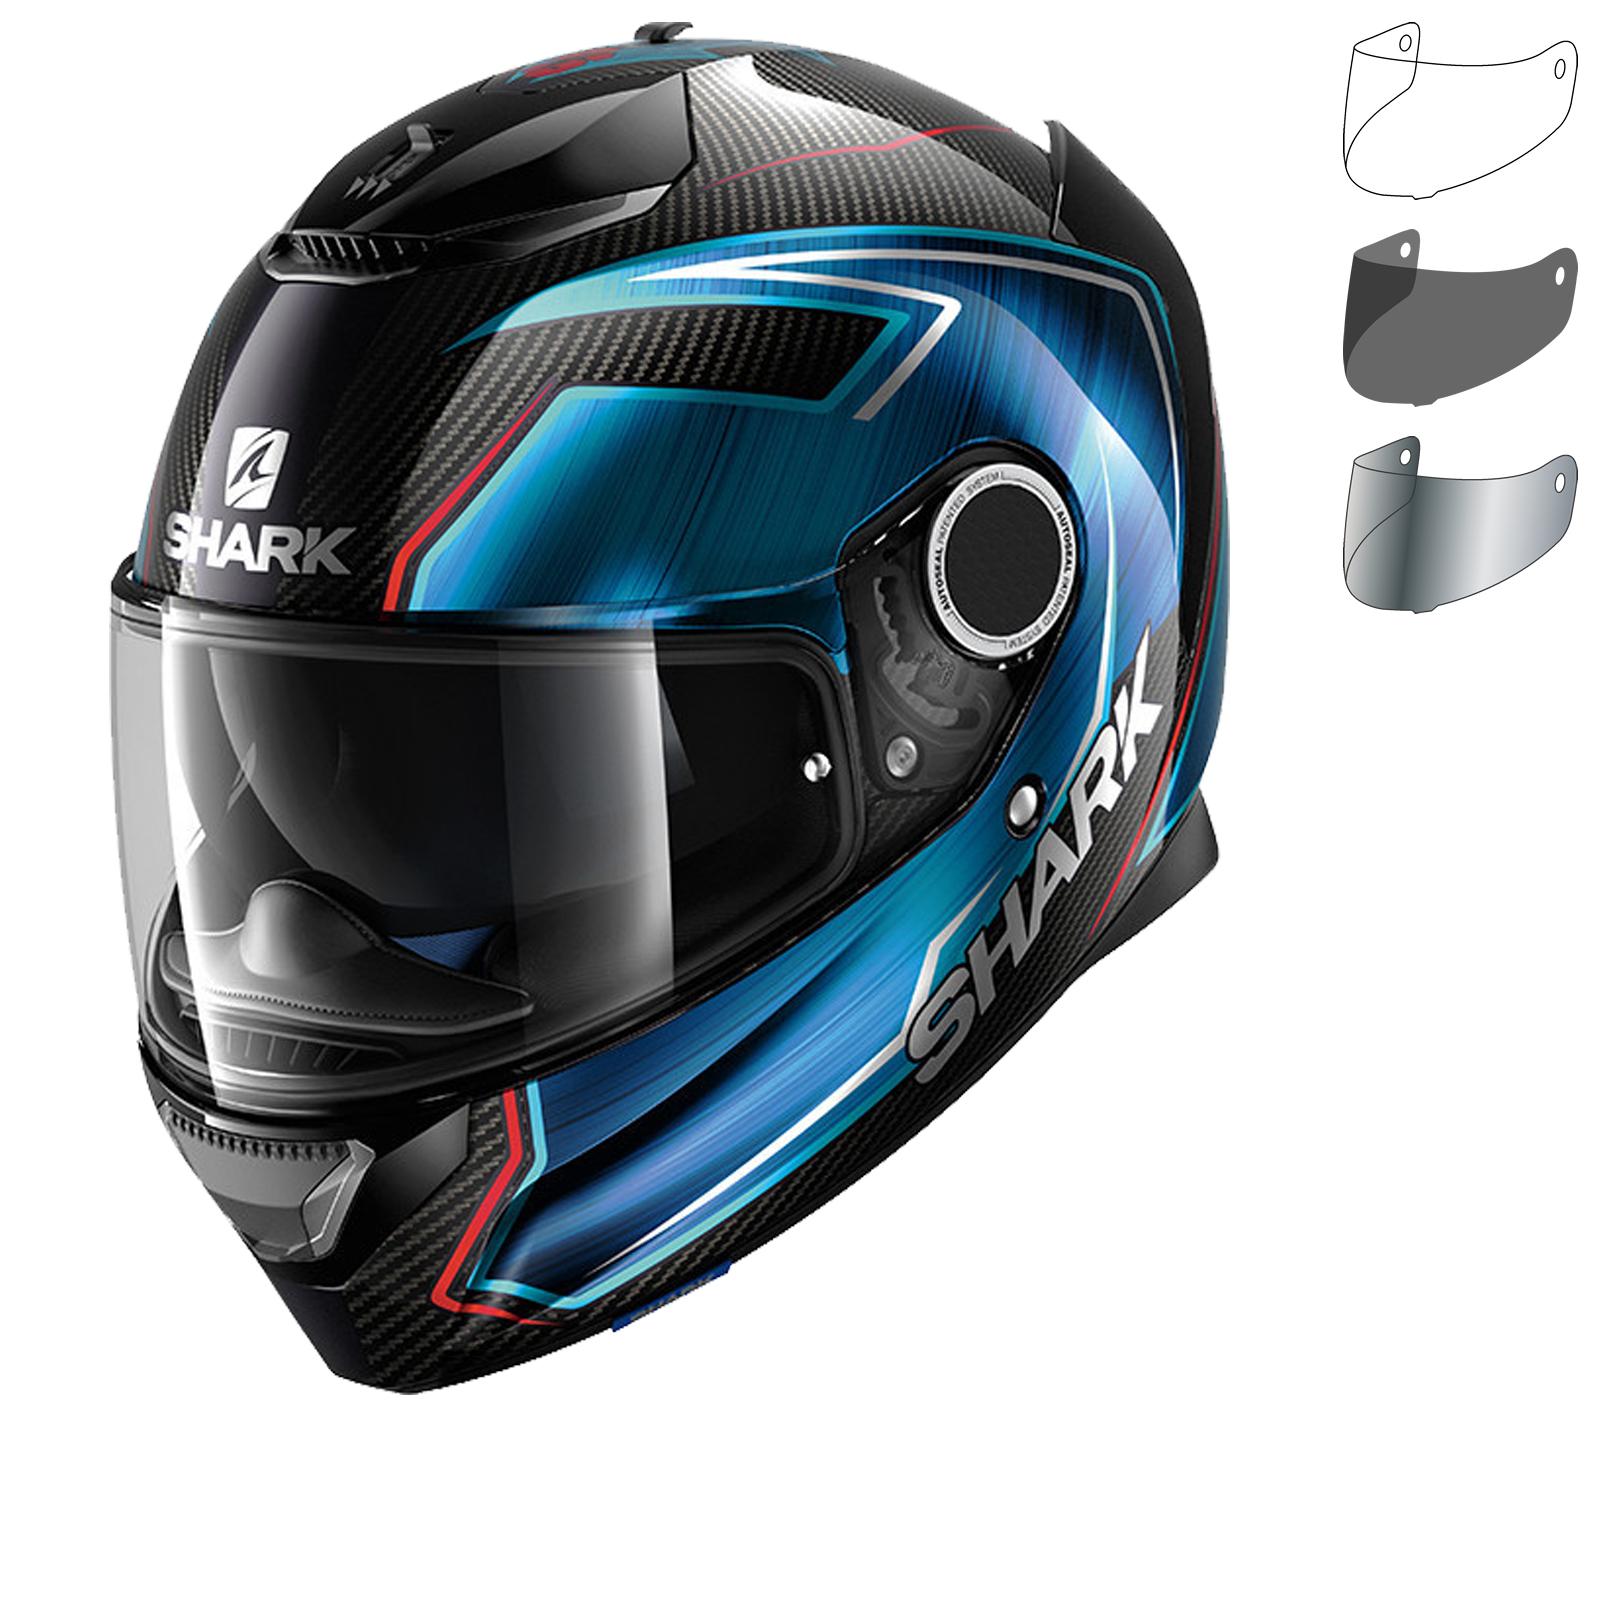 shark spartan carbon guintoli motorcycle helmet amp visor